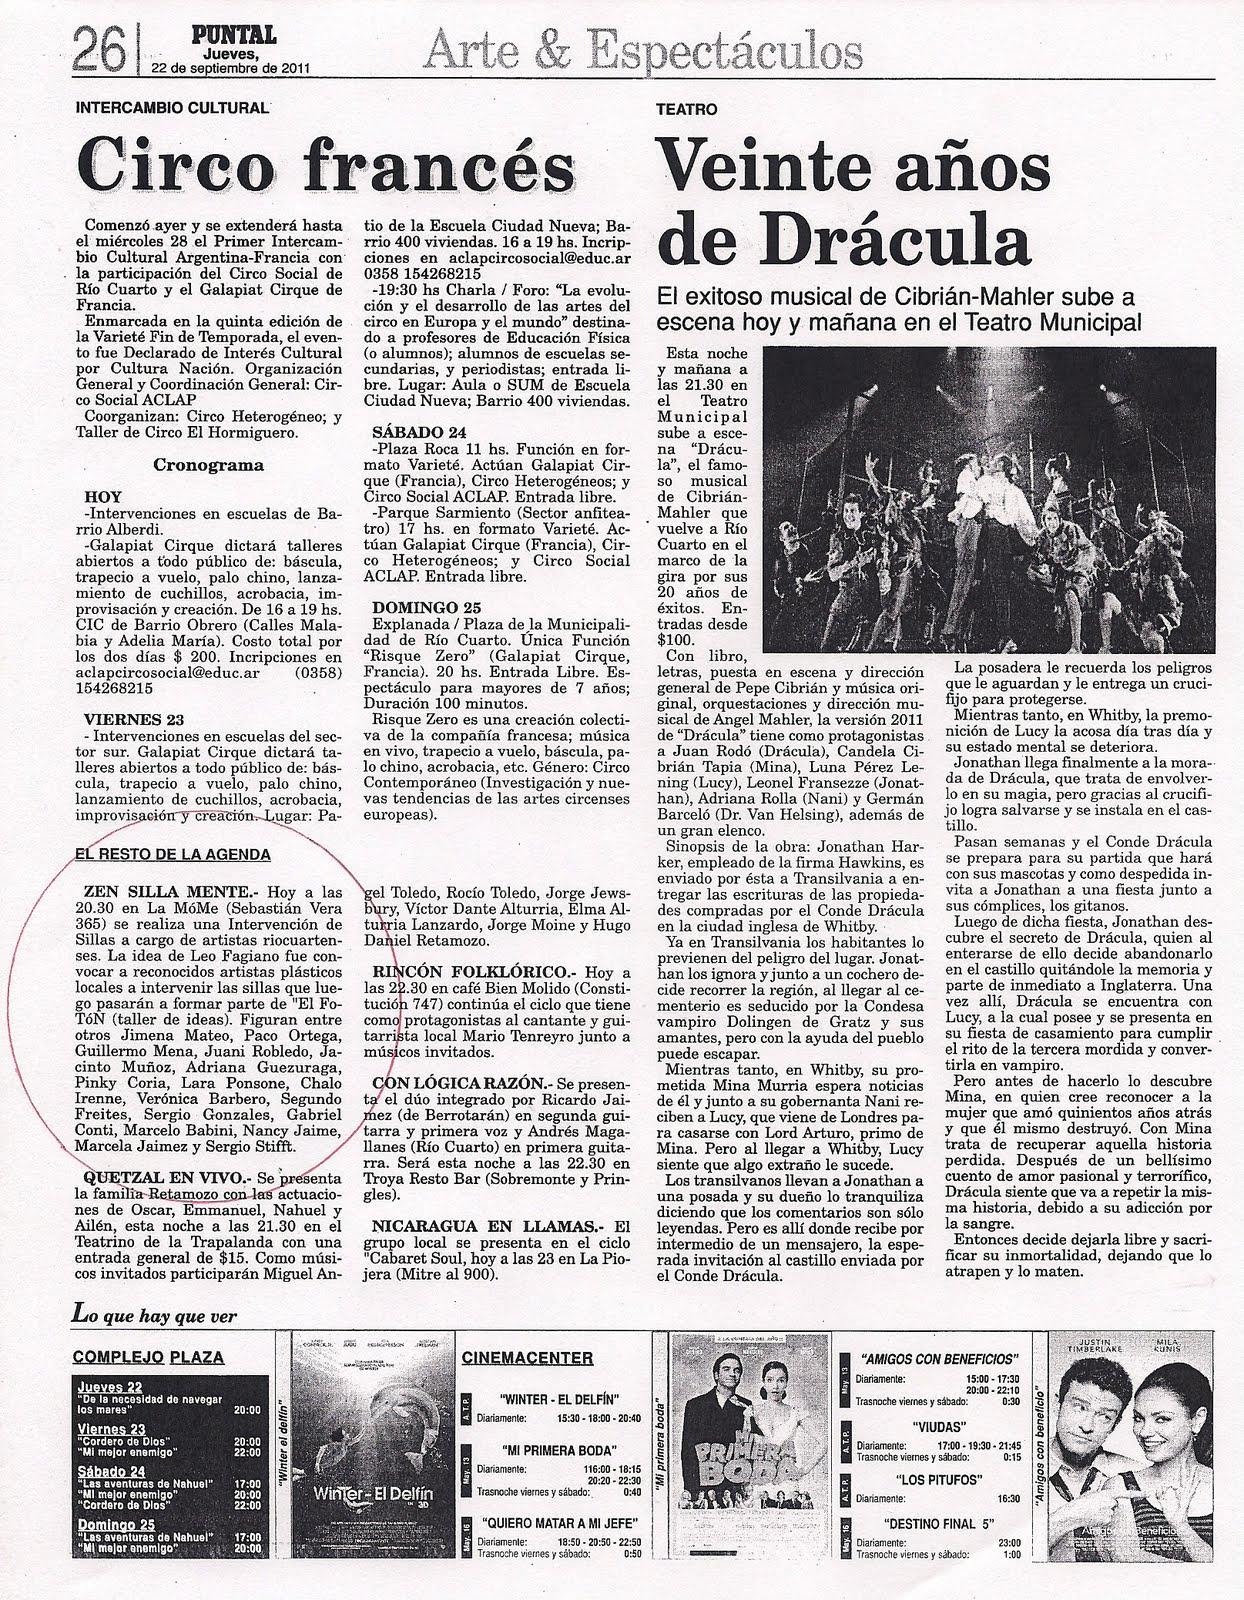 Awesome Diario Puntal Rio Cuarto Gallery - Casas: Ideas & diseños ...